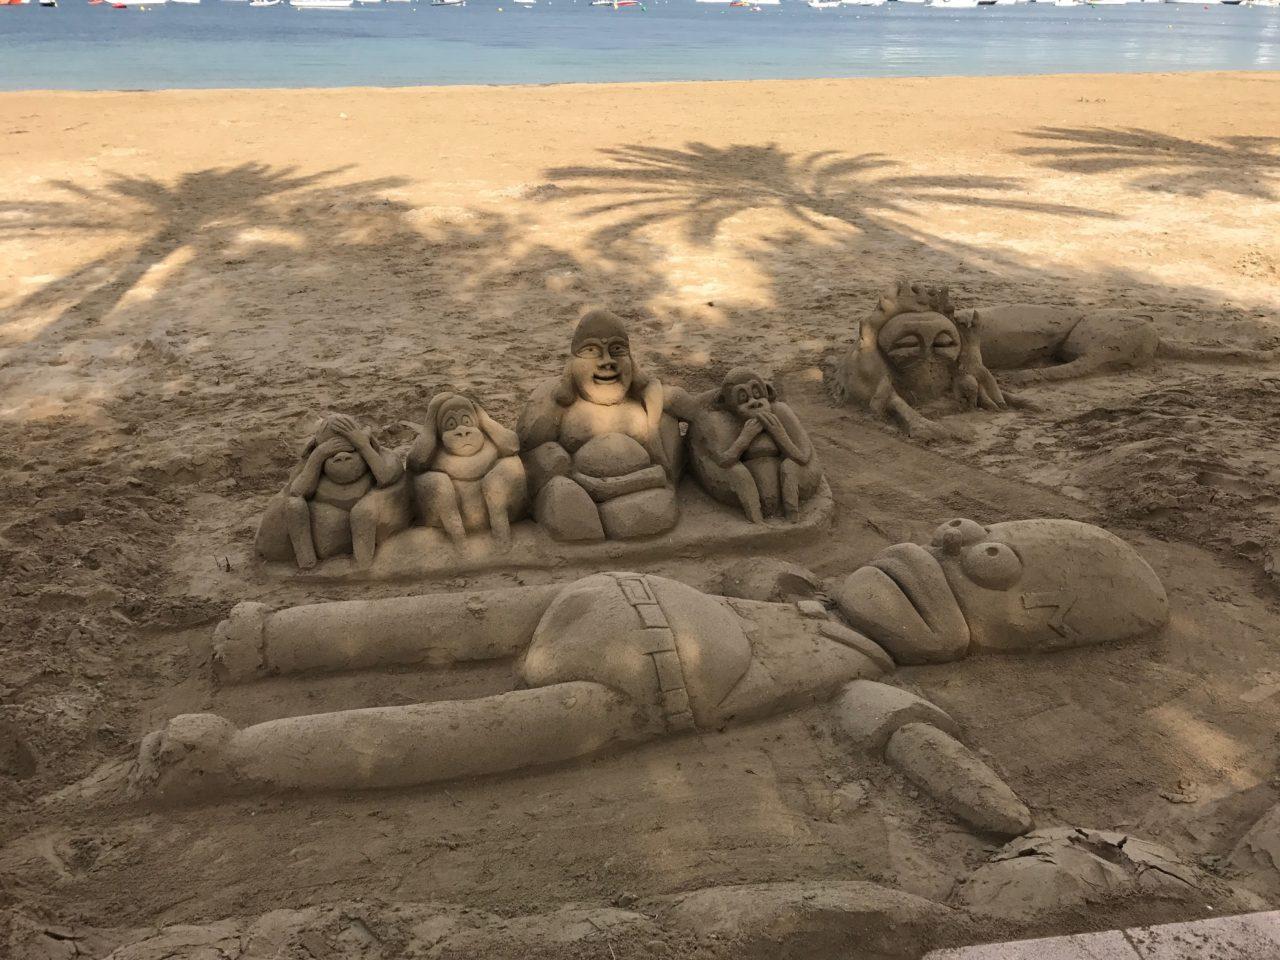 Simpsons And Monkey Sand Sculpture Art On Beach